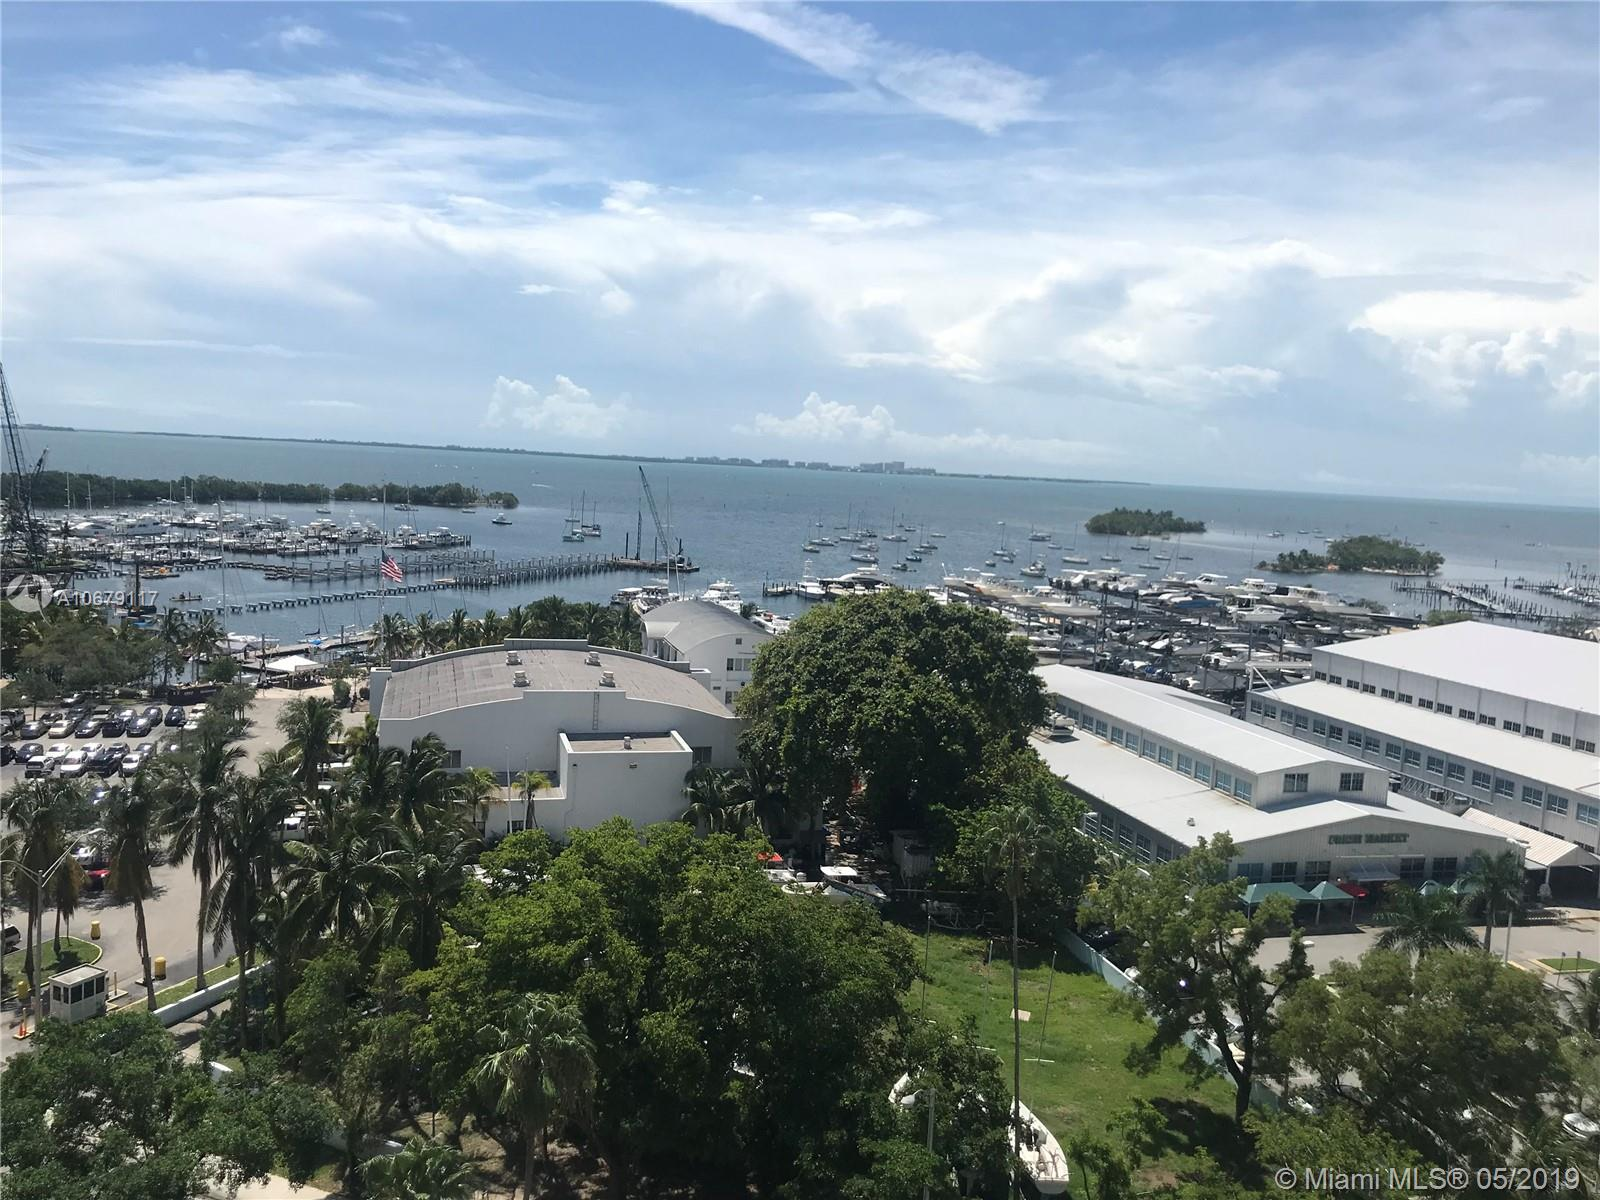 2645 S Bayshore Dr, 1003 - Miami, Florida